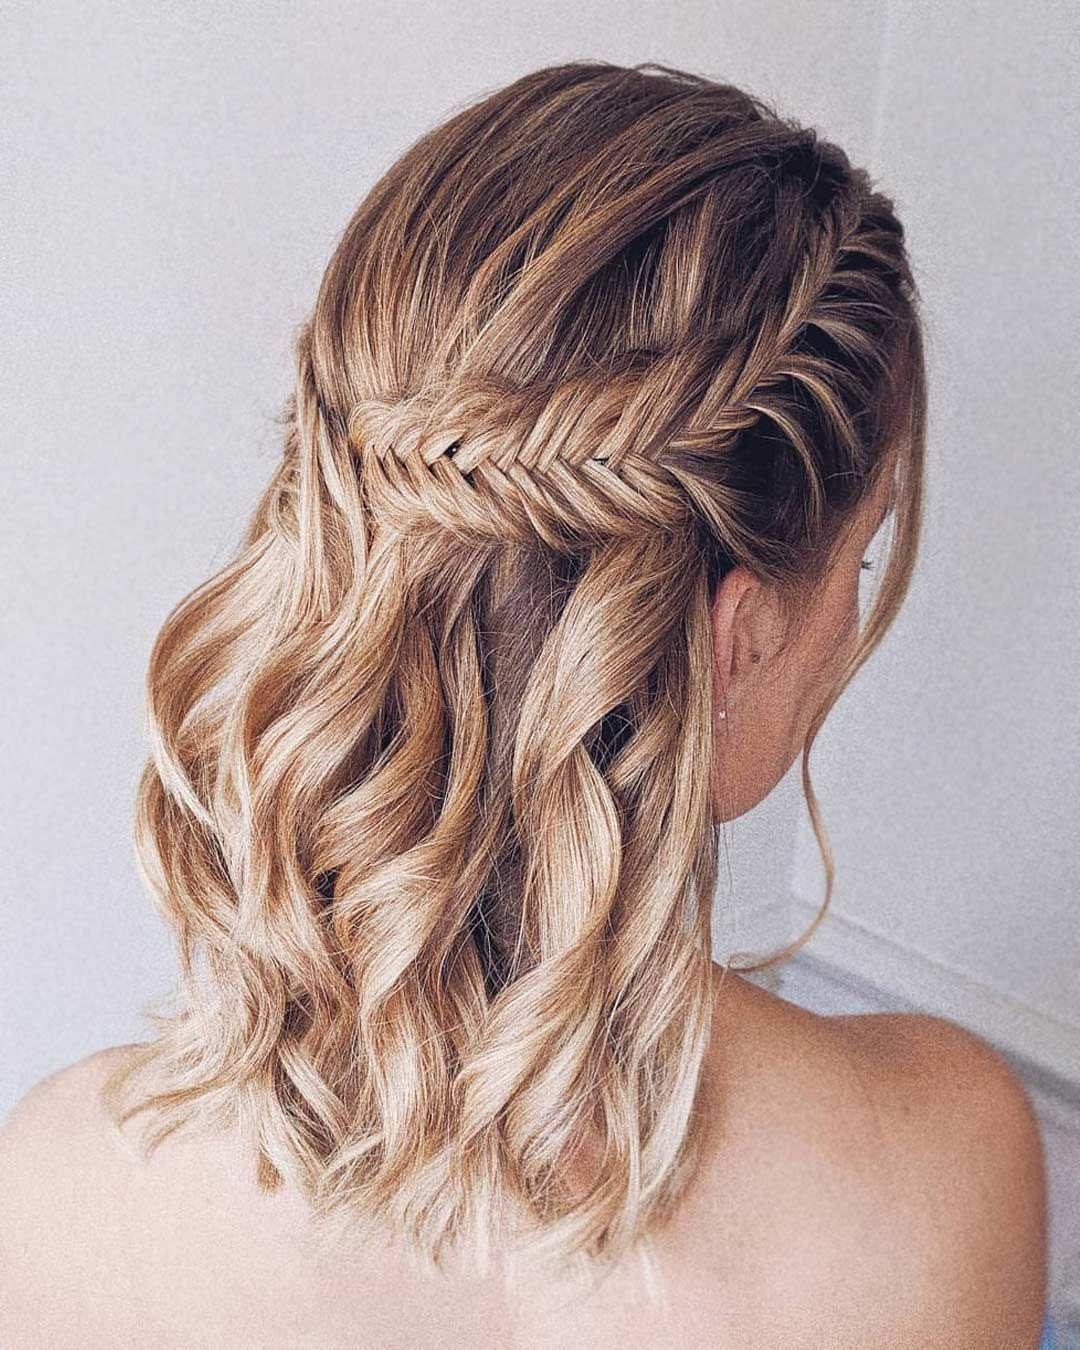 Wedding Hairstyles 2021 Fantastic Hair Ideas In 2020 Bridesmaid Hair Short Hair Styles Down Hairstyles